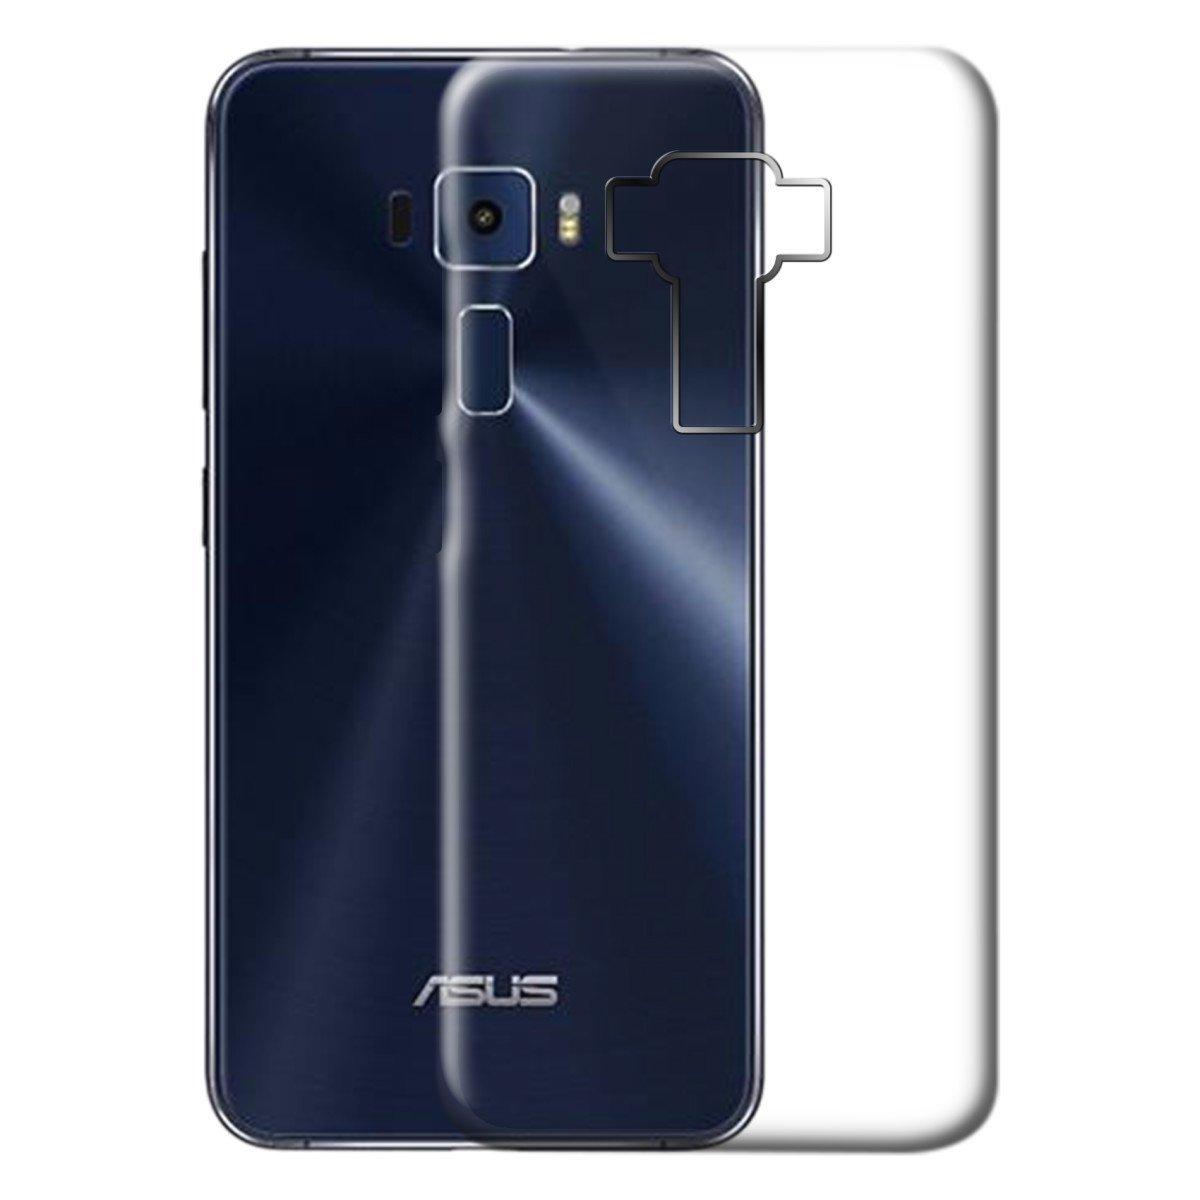 new concept 7cad3 bf775 WTF Transparent Soft Back Case Cover for Asus Zenfone 3 ZE520KL (5.2 Inch)